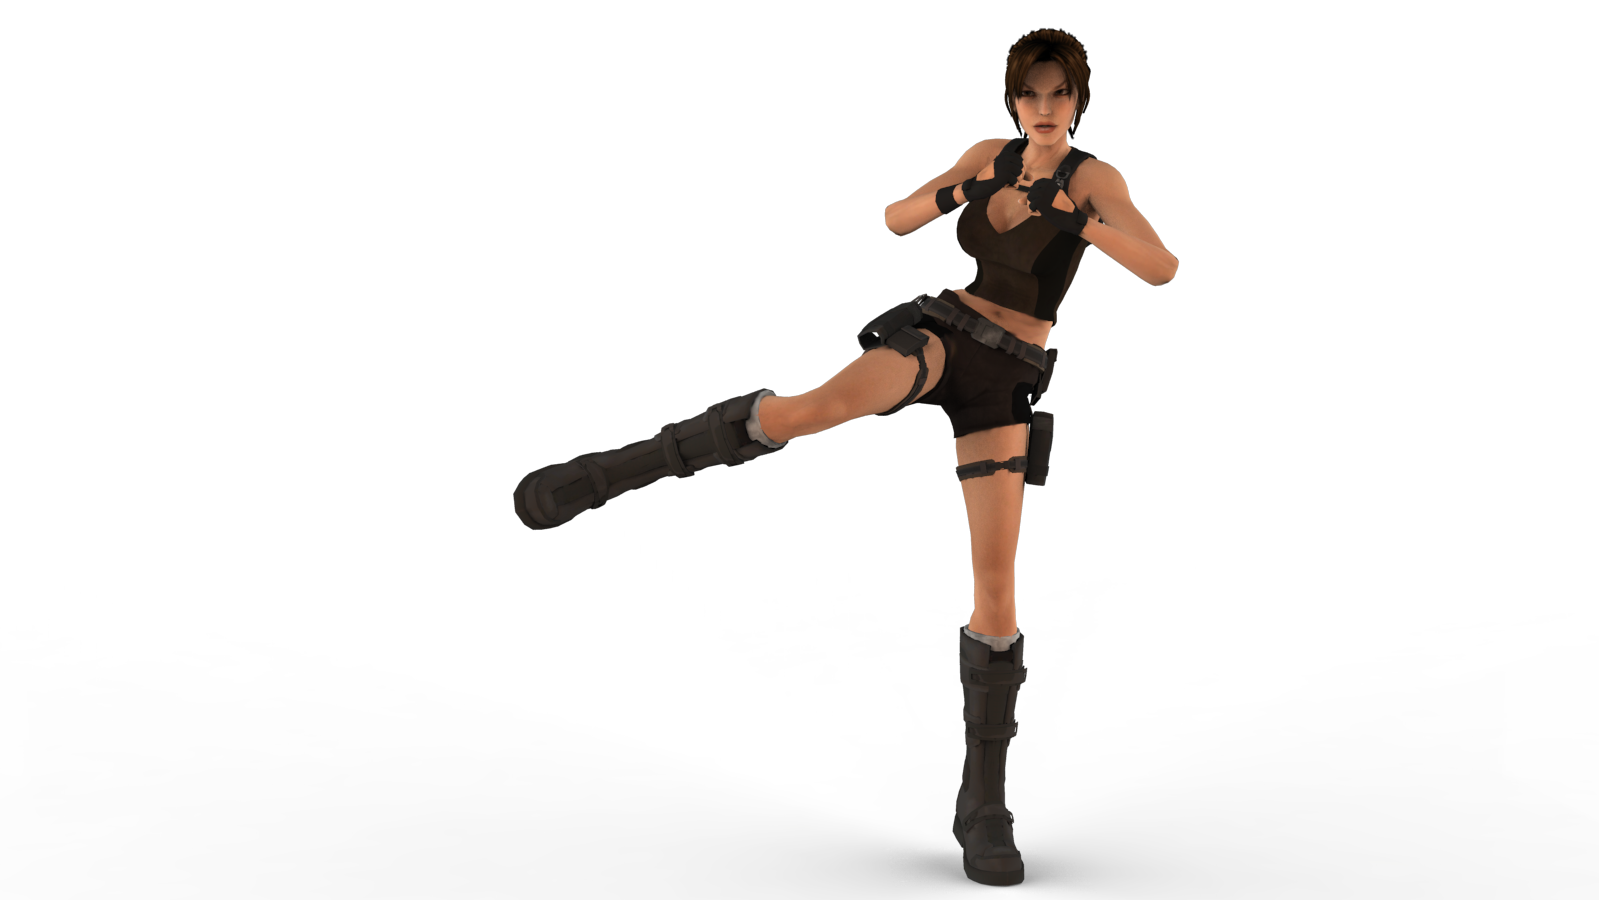 Lara croft gif sexy clips